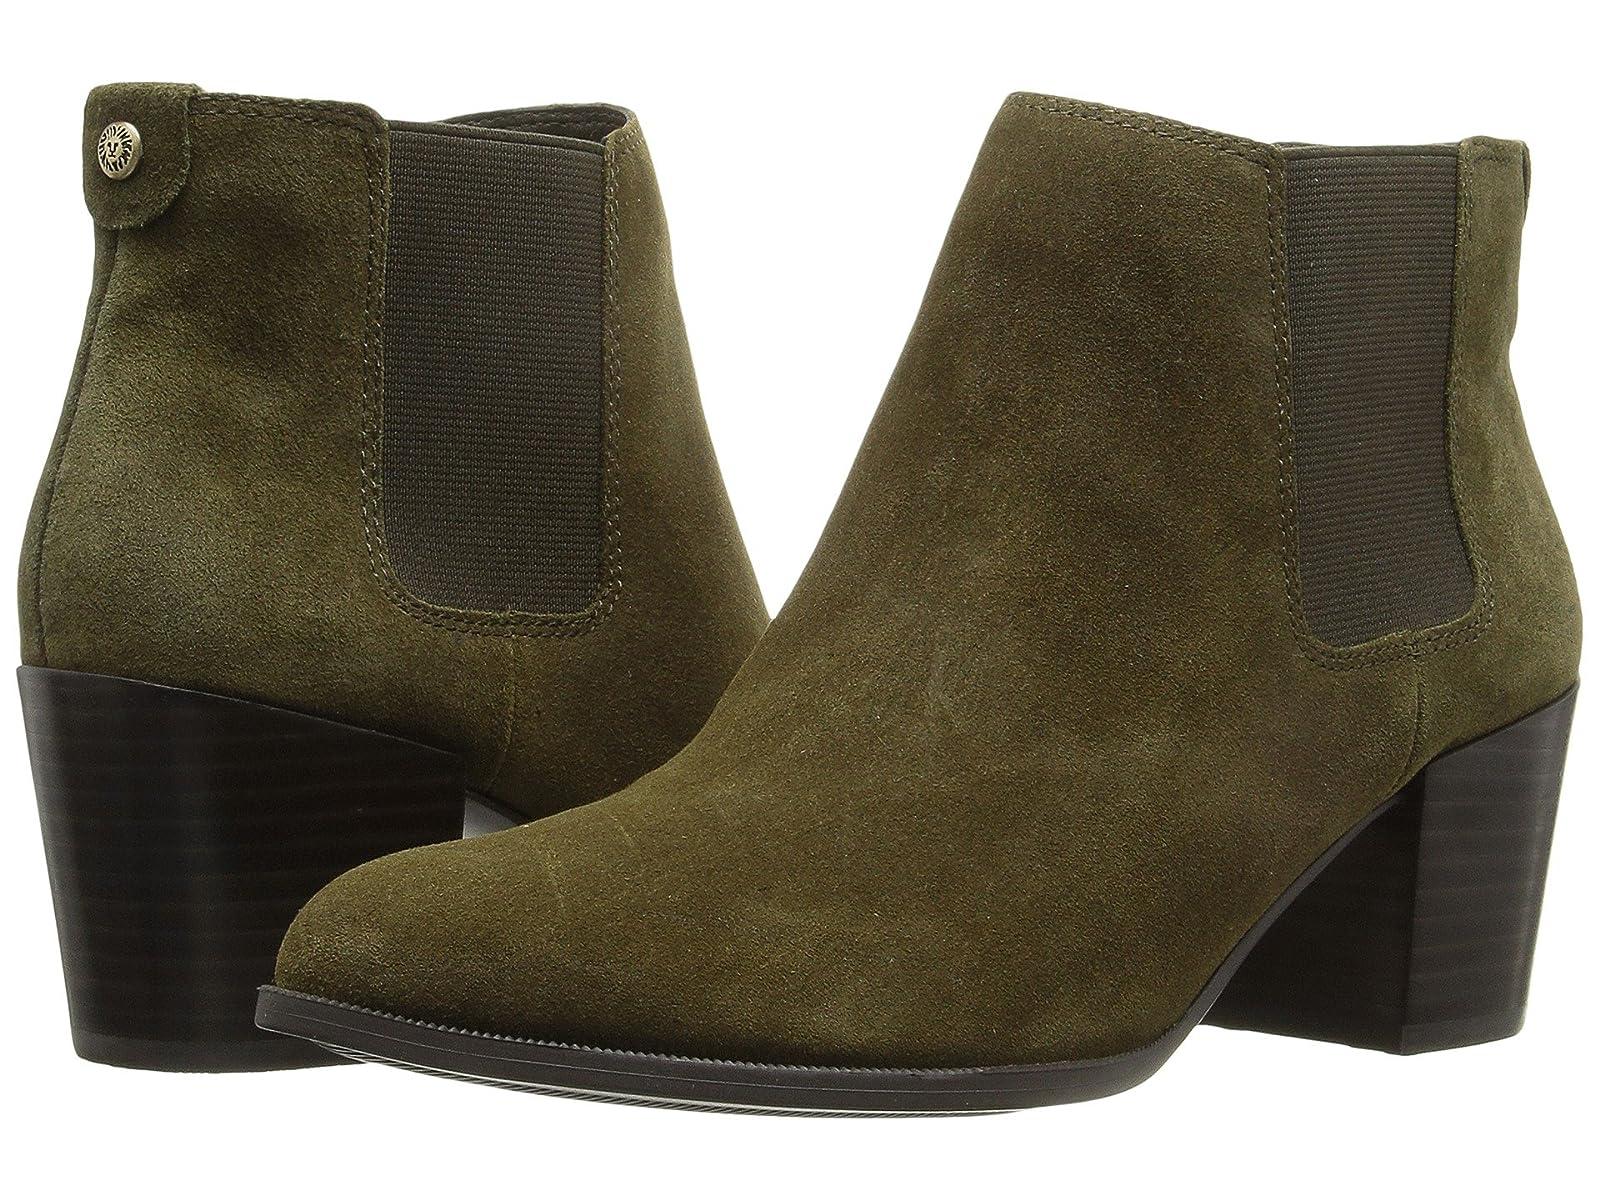 Anne Klein GeordannaCheap and distinctive eye-catching shoes